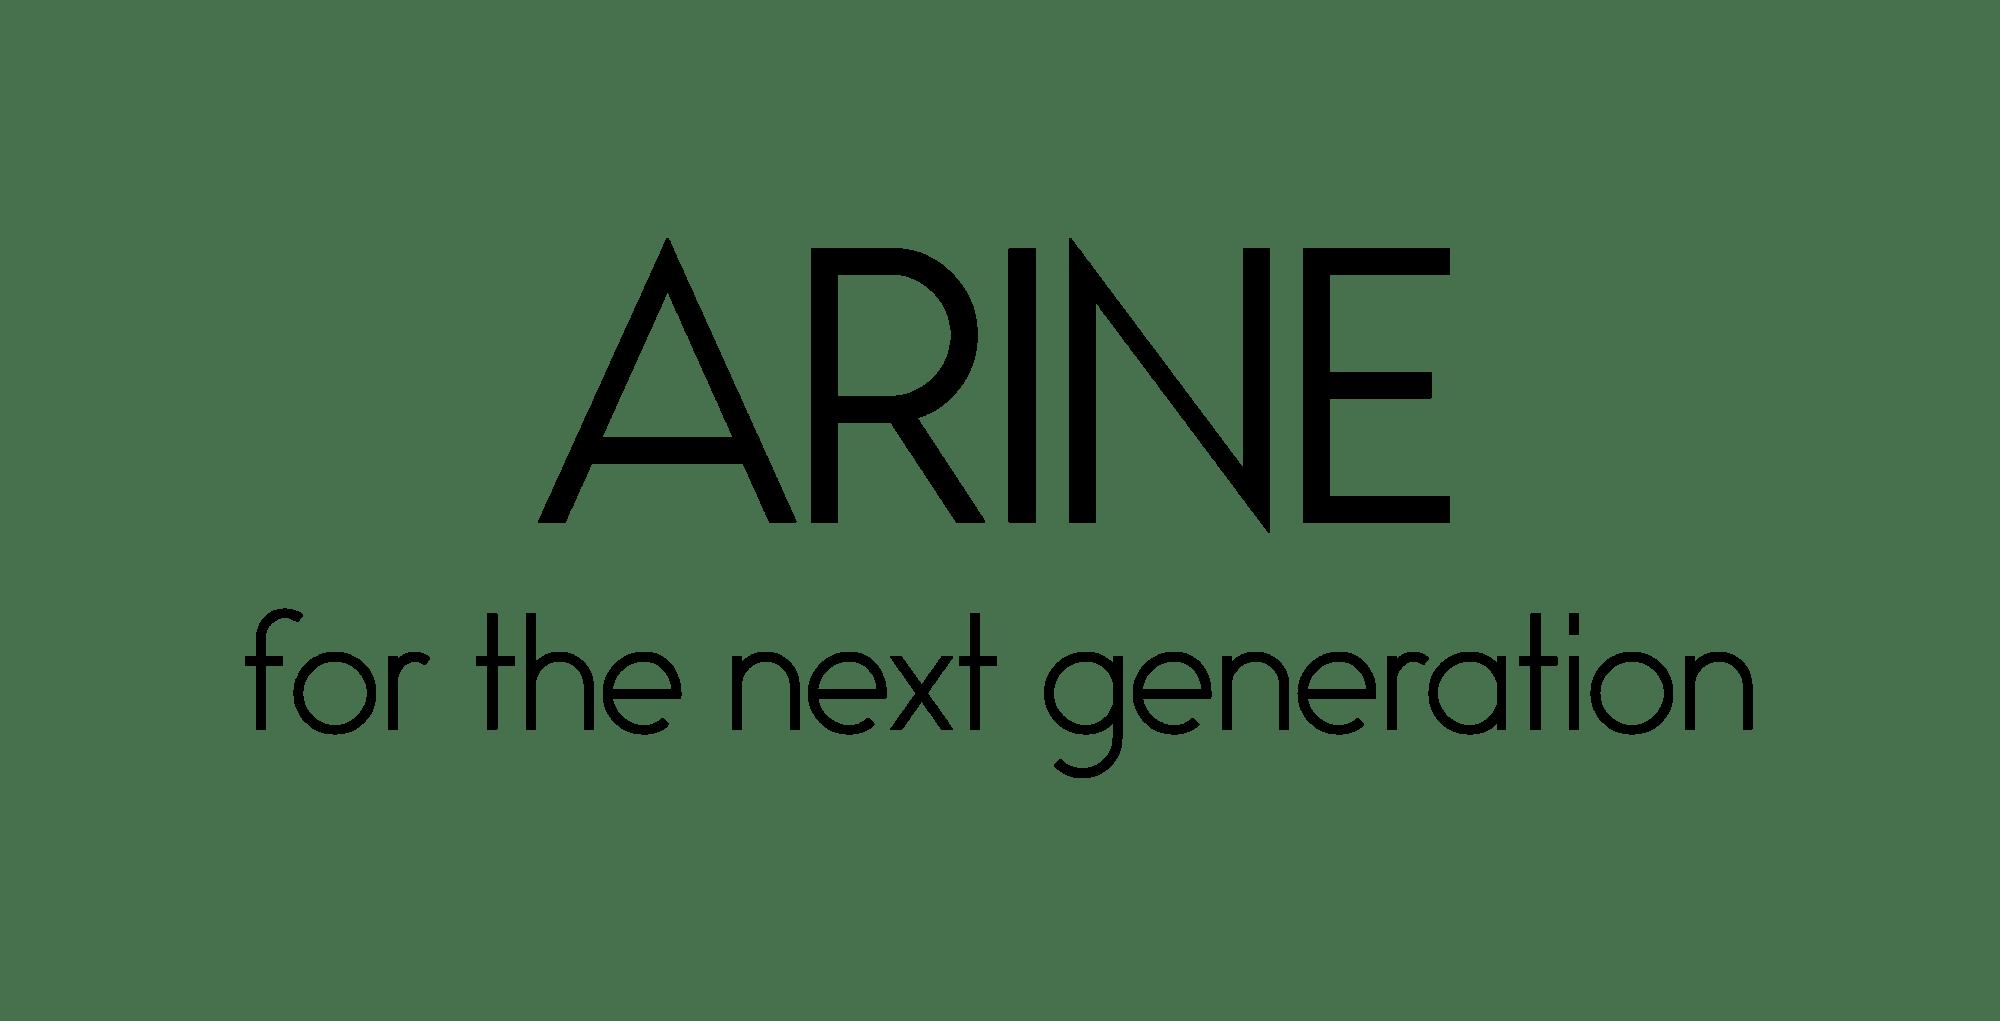 ARINE BOXER - בוקסר חוסם קרינה.